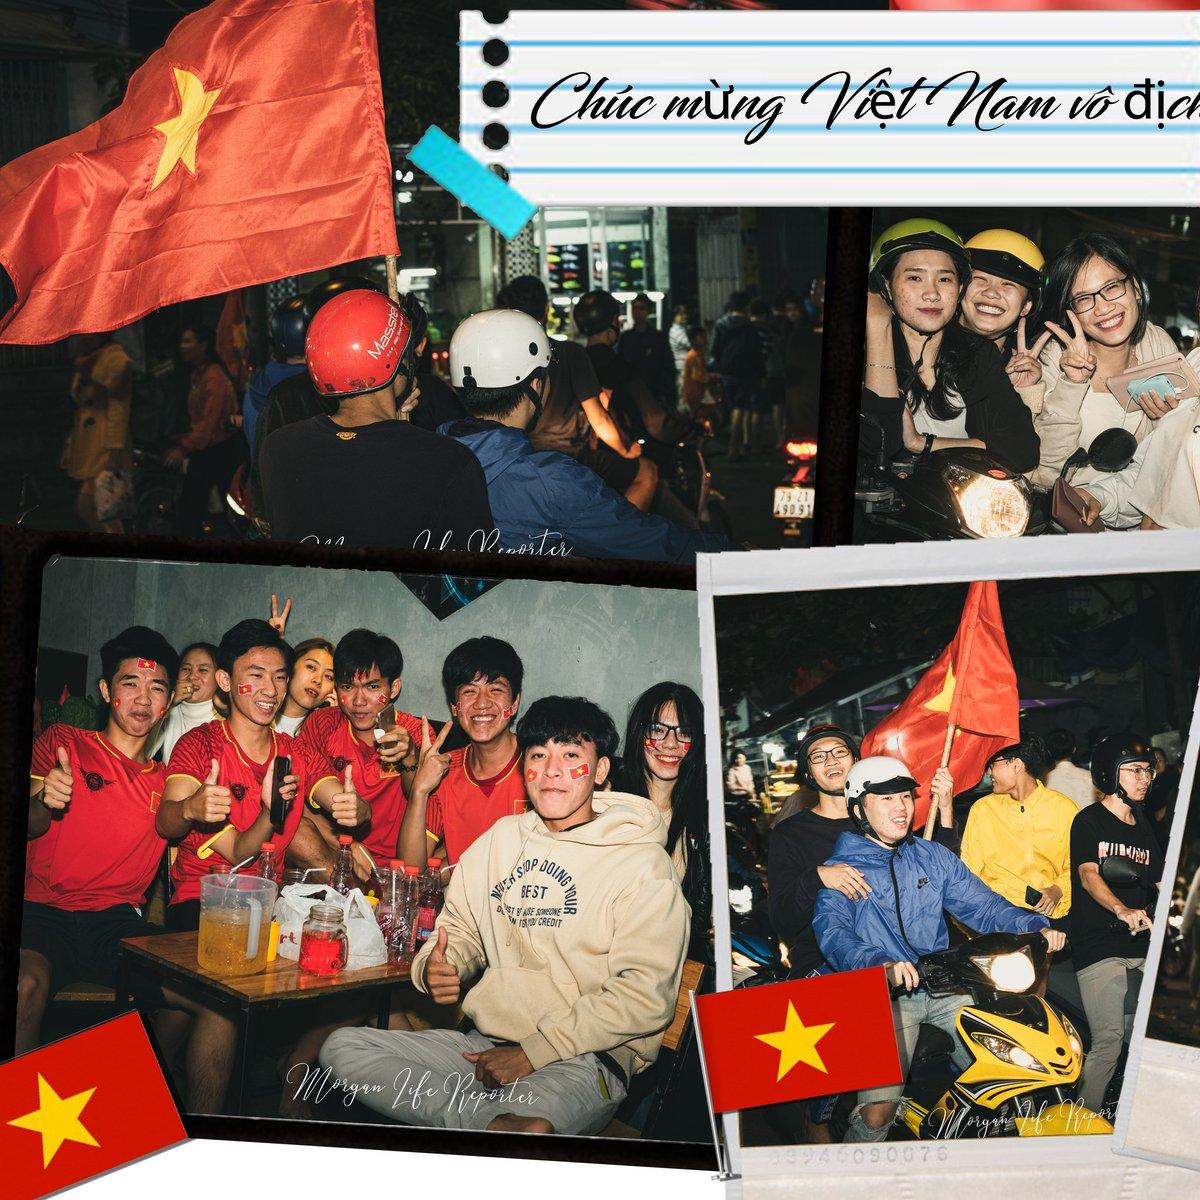 #photographer  #photography  #sports  #football  #Vietnam   #fujifilm  @fujifilmfrance  #street   #travelphotography  #Asia  #asiedusudest  @_fujilove_  BRAVO à léquipe U22 Vietnamienne 🇻🇳